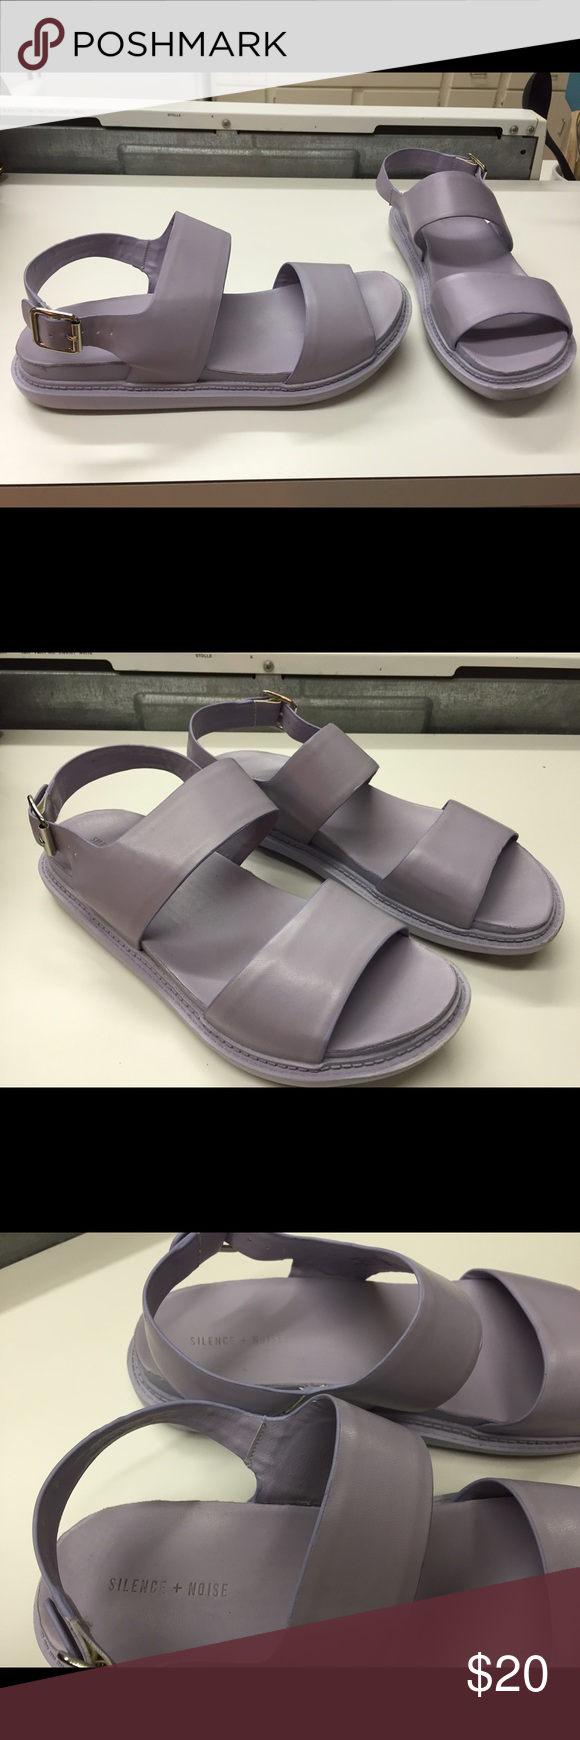 Lavender sandals shoes - Urban Outfitter Silence Noise Lavender Sandals